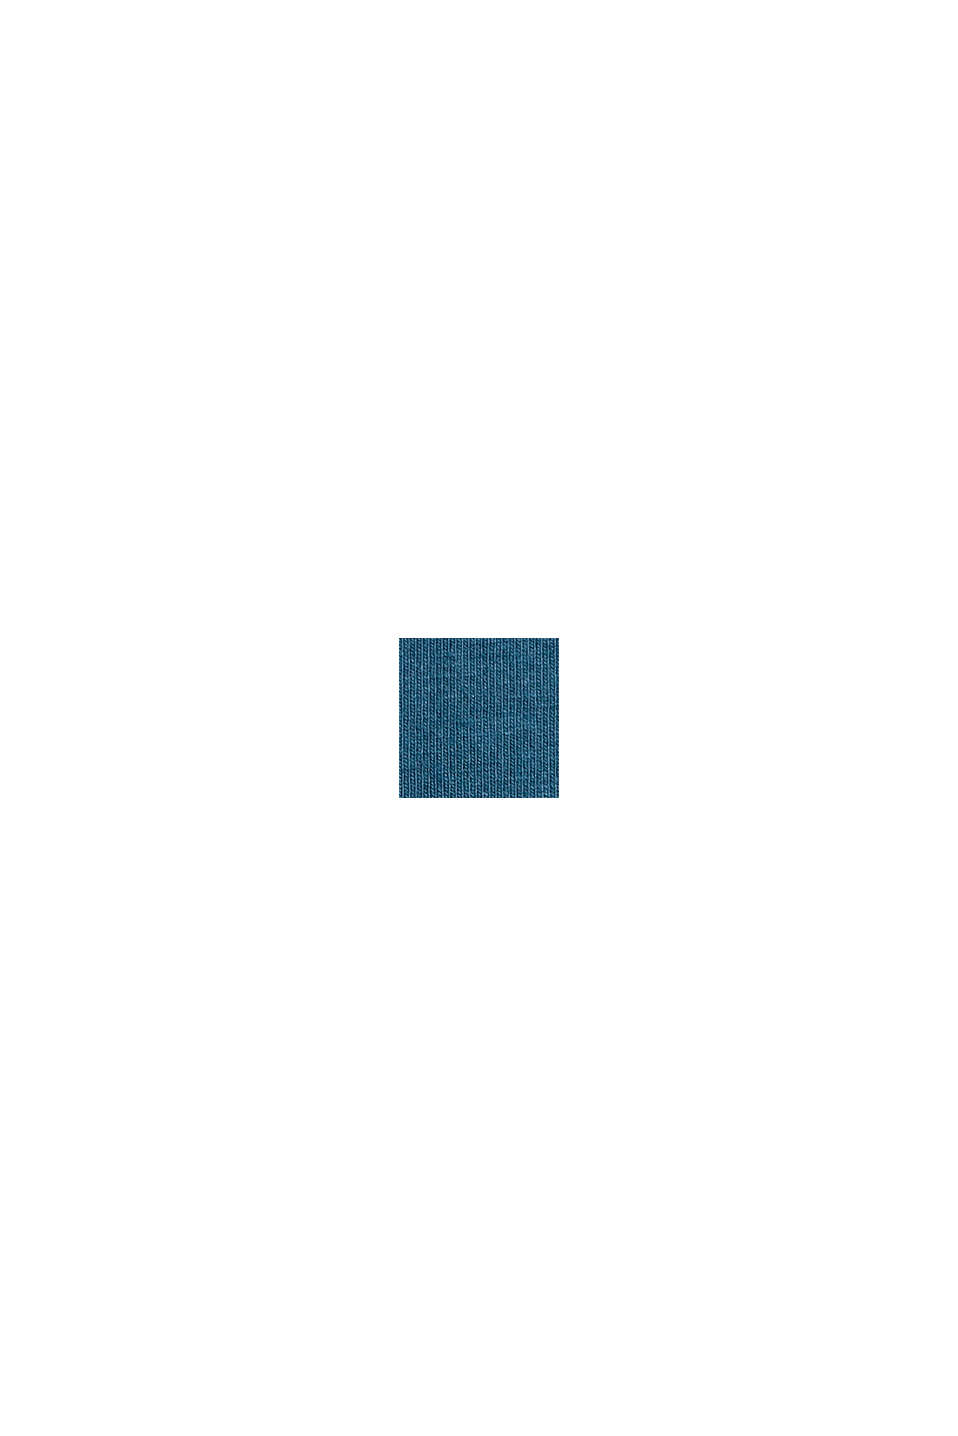 T-Shirts Regular Fit, PETROL BLUE, swatch